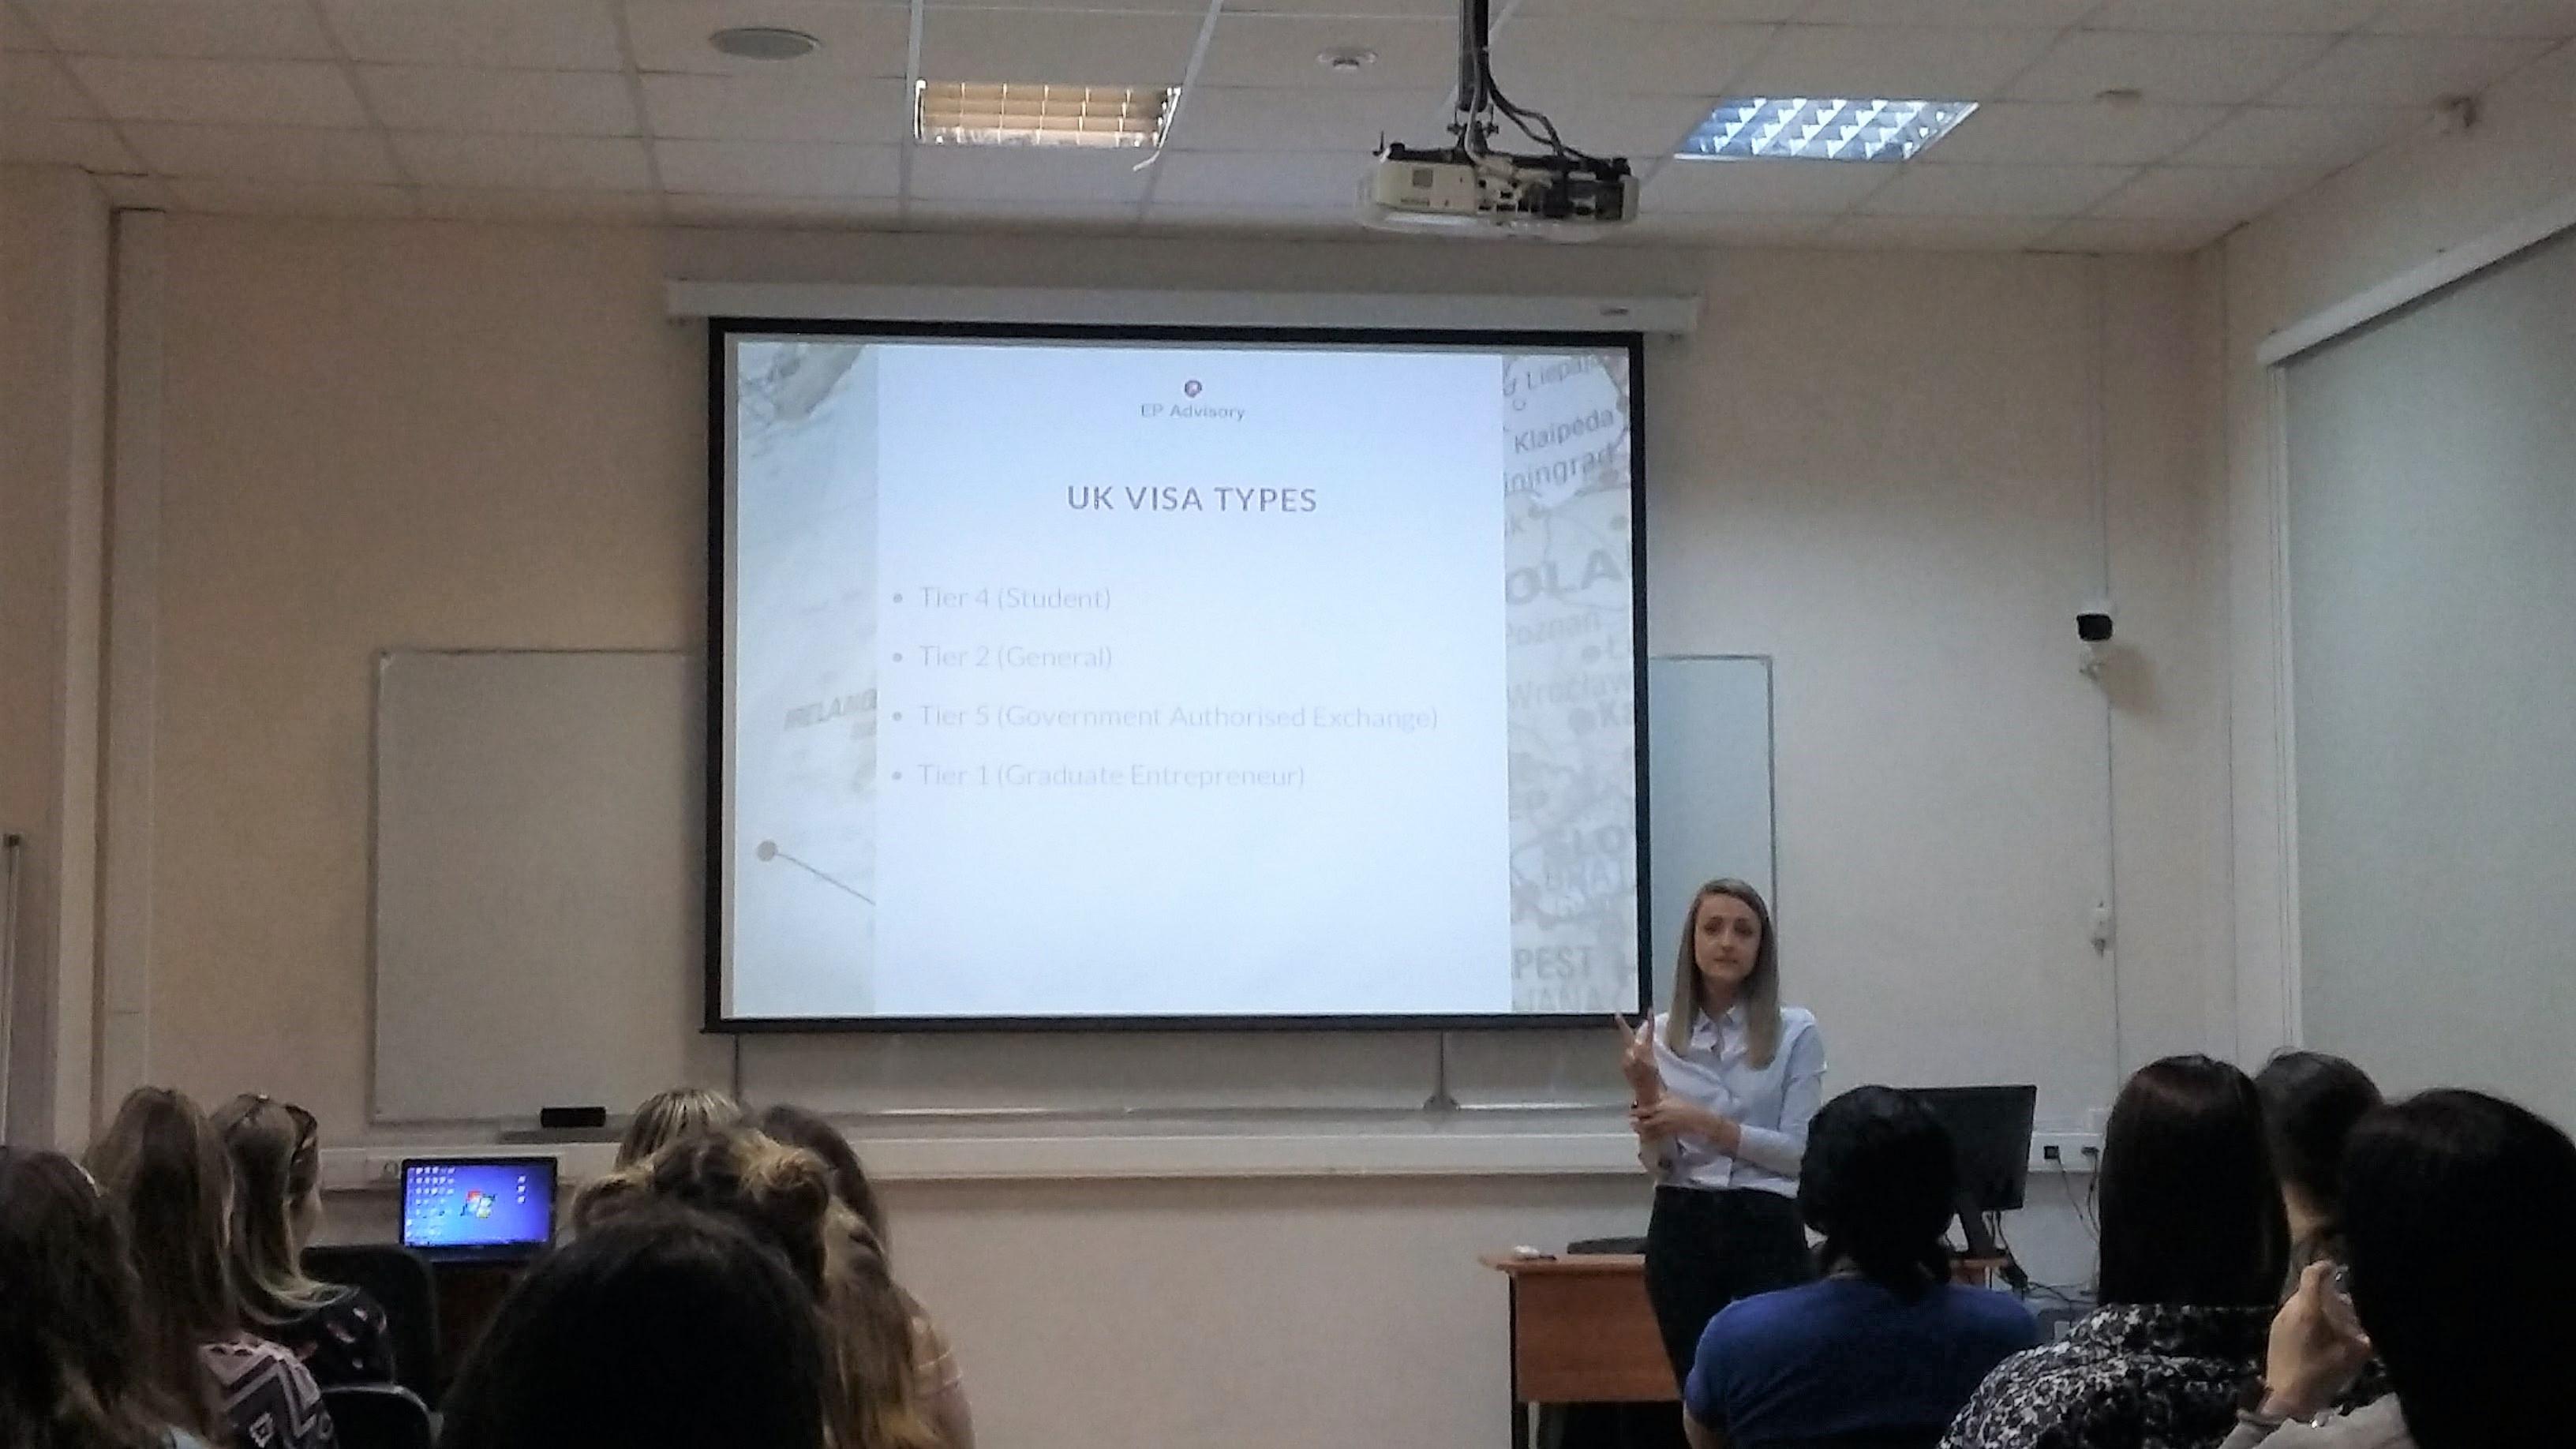 Lecture by Elizaveta Proselkova, founder of EP Advisory